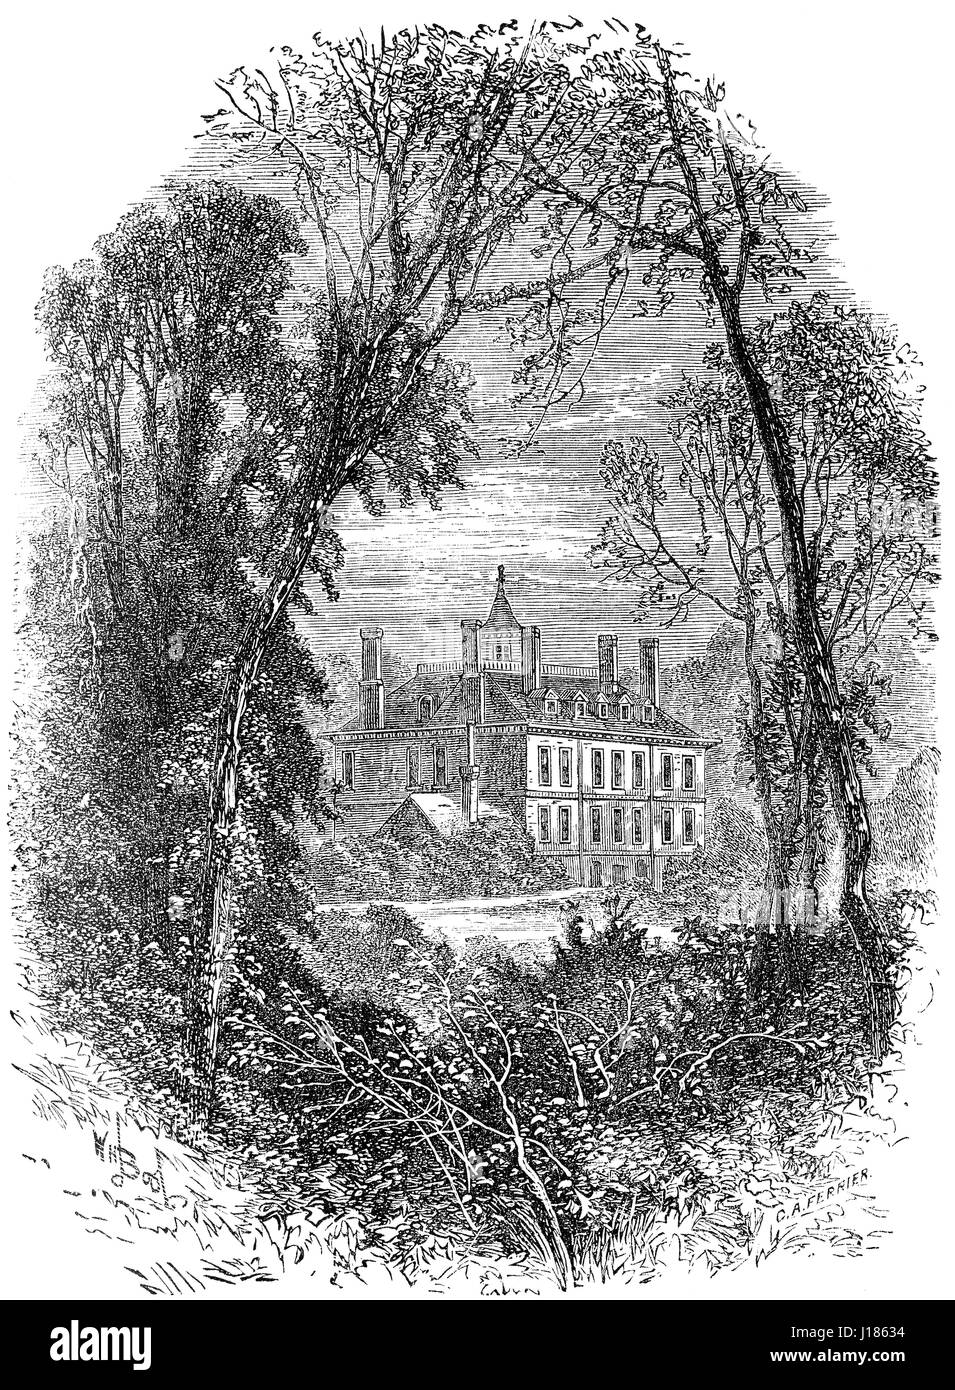 Maison ABNEY, Stoke Newington, Arrondissement de Hackney, Londres, UK Photo Stock